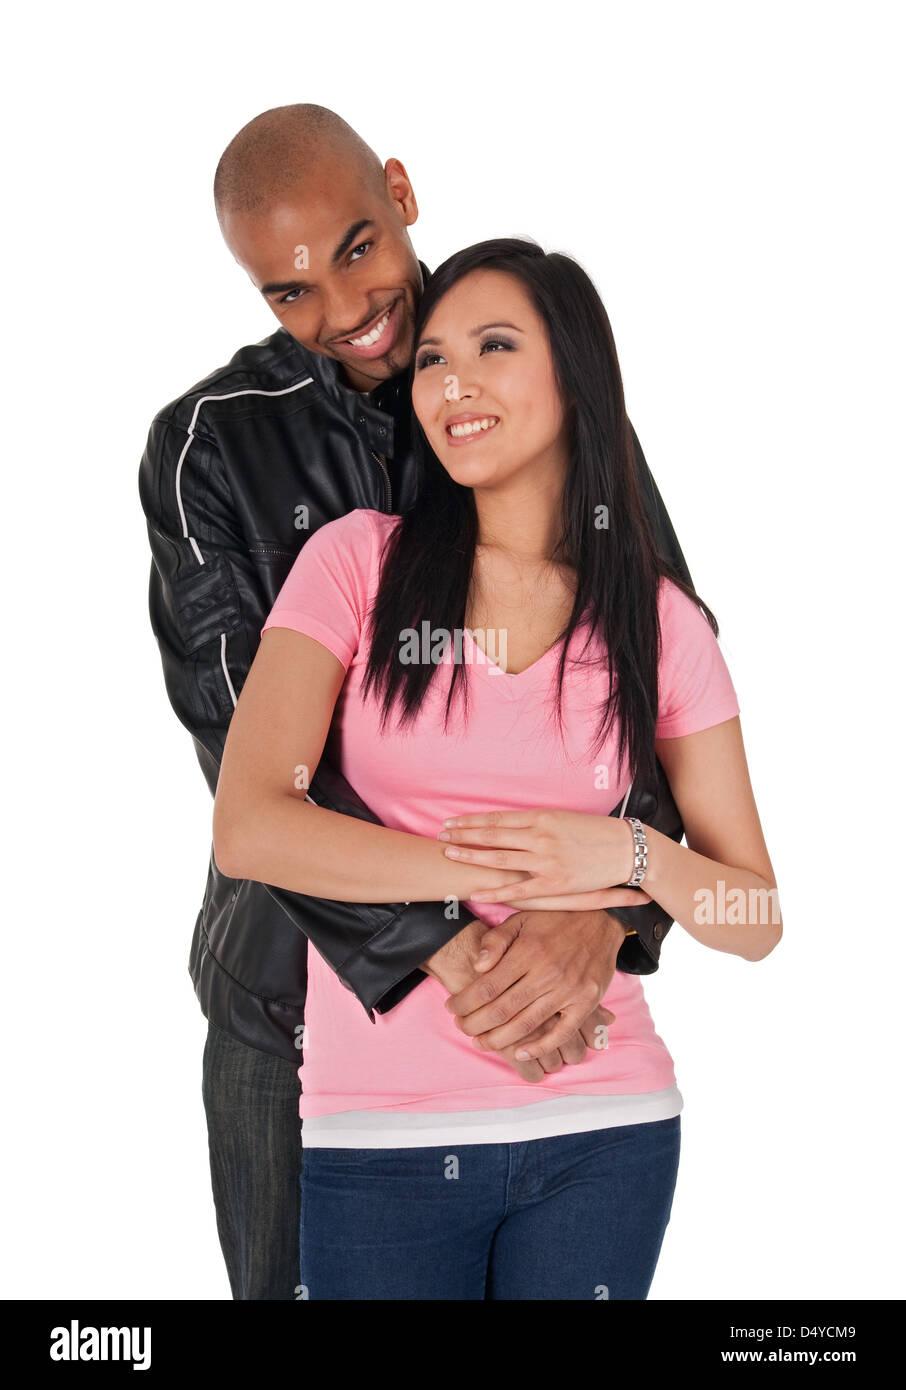 Breve asiatico ragazzo dating